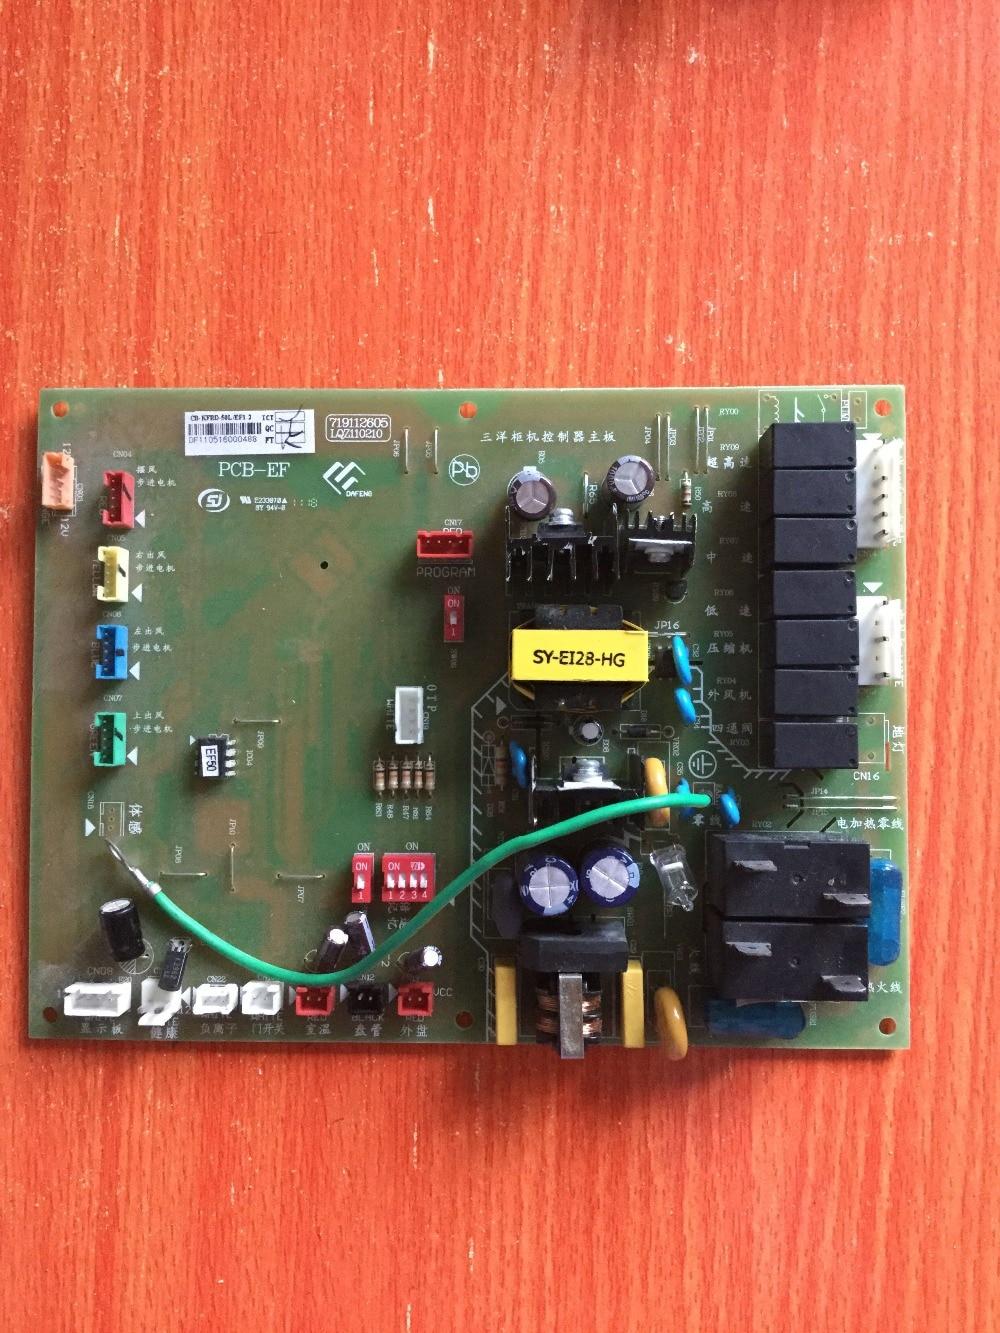 B-KFRD-50L/EF1-2 USED Good Working